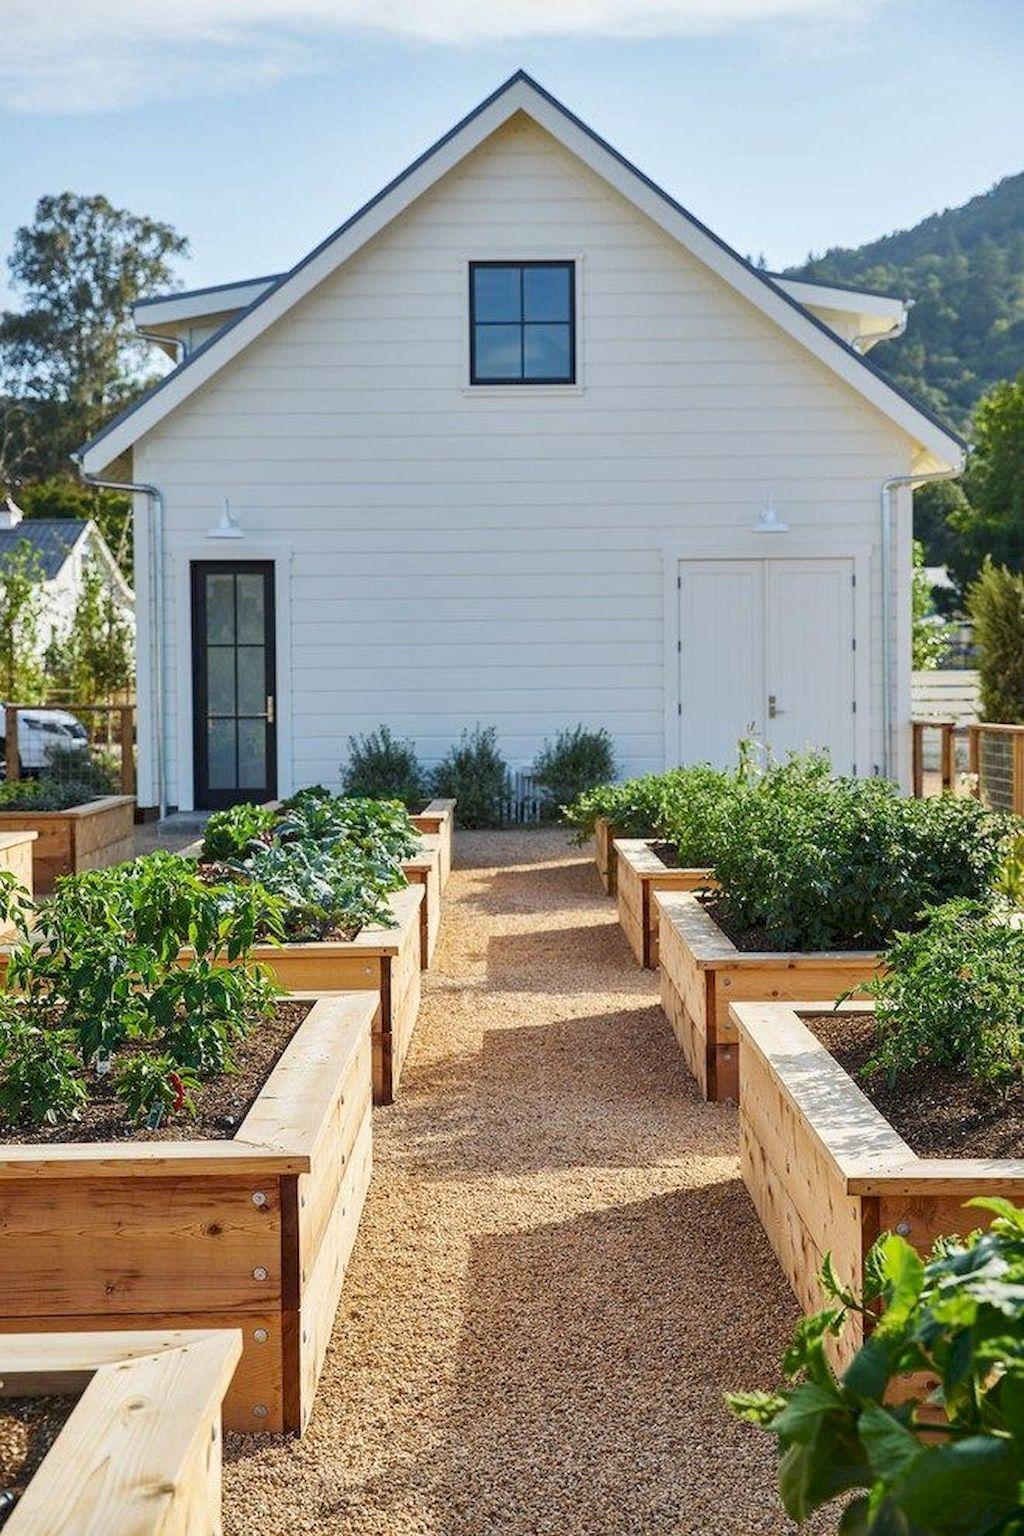 55 Diy Raised Garden Bed Plans Ideas You Can Build Raised